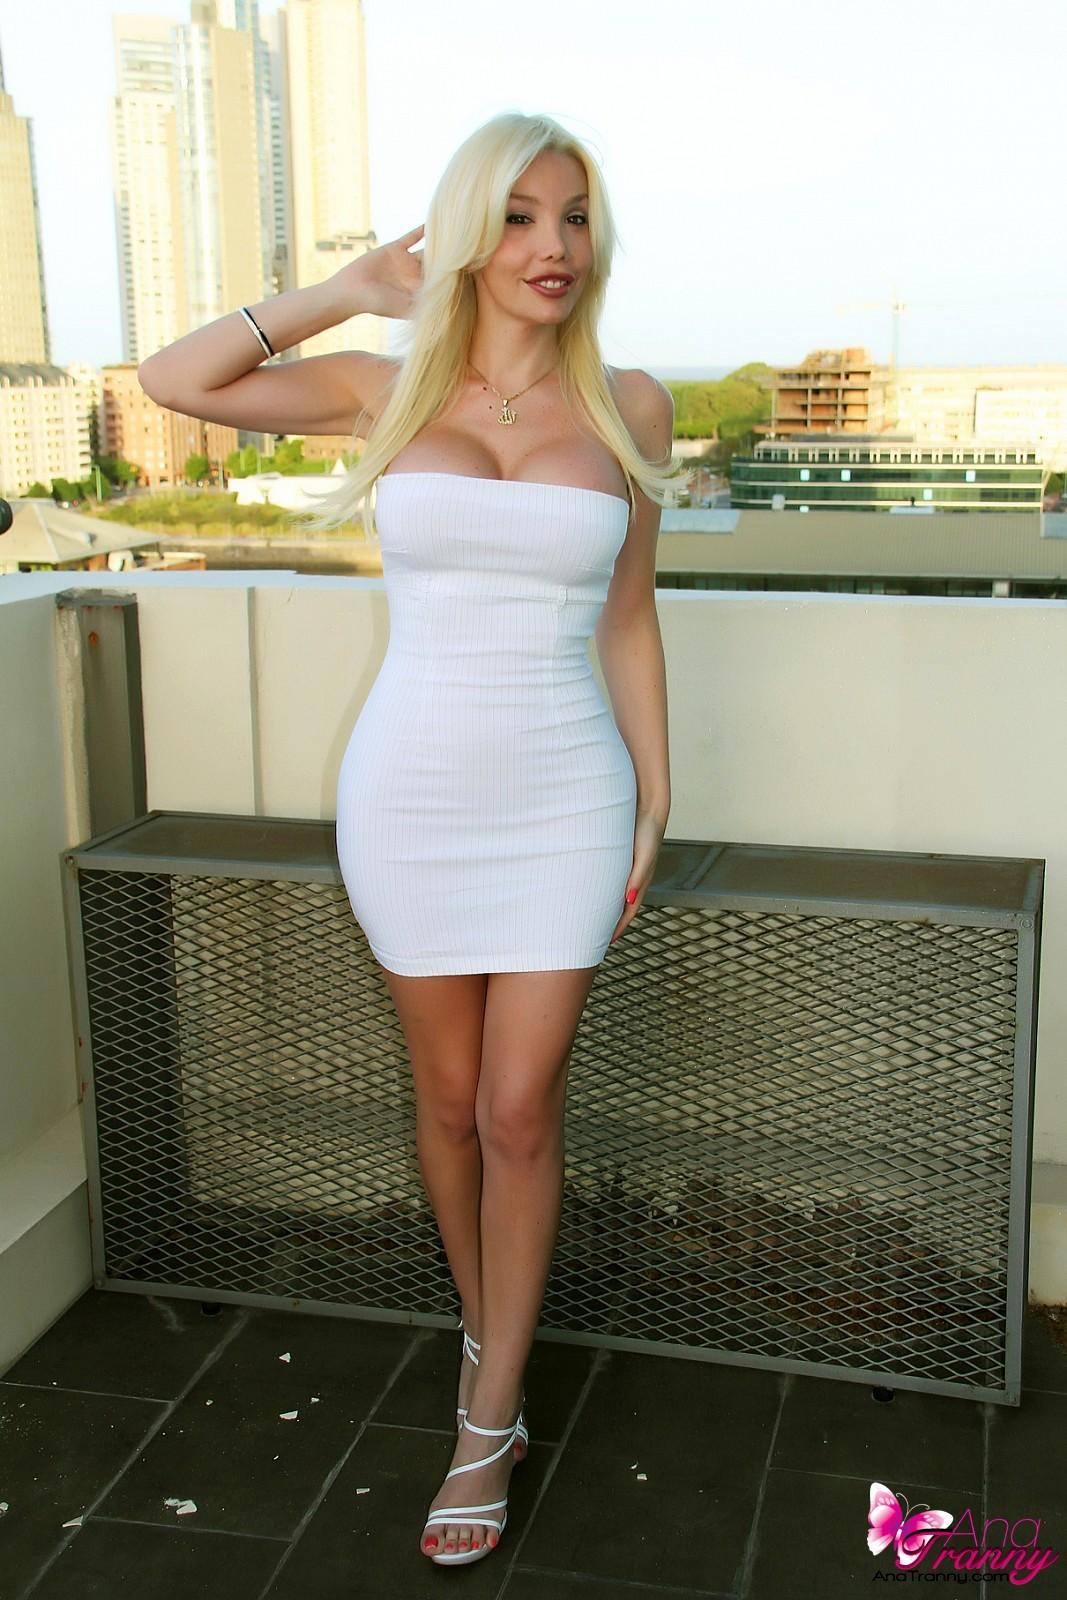 Yummy TGirl Ana Mancini In Fantastic Tight Skirt